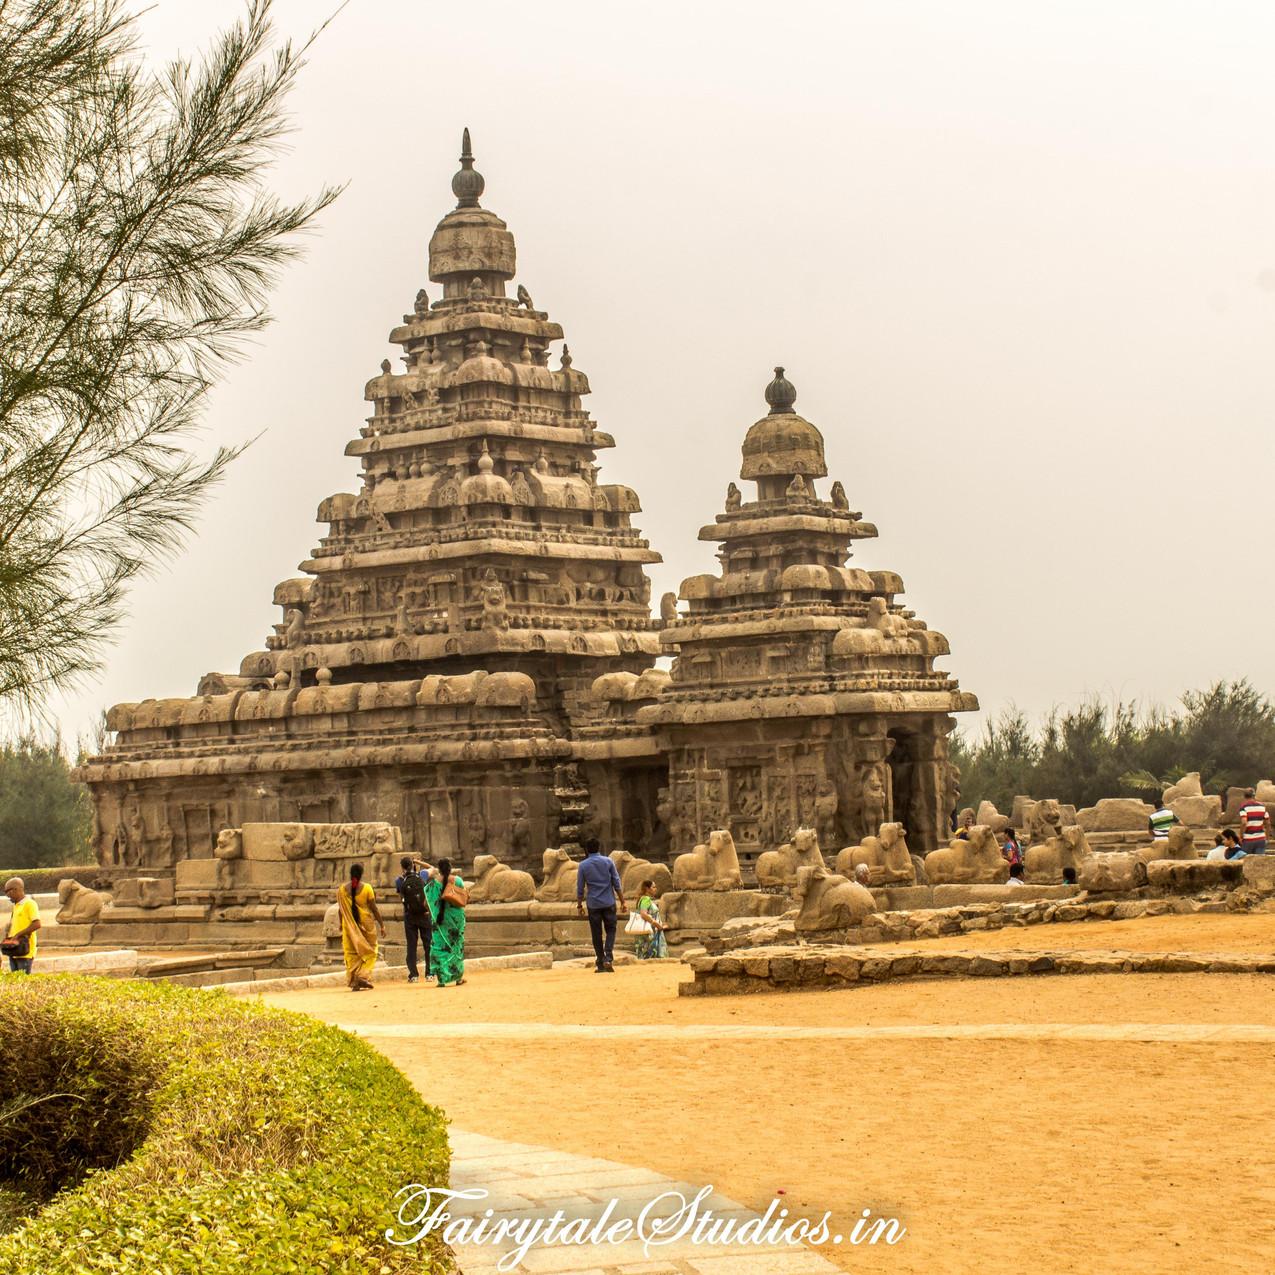 Seashore Temple_Mahabalipuram_Fairytale Travel Blog (2)